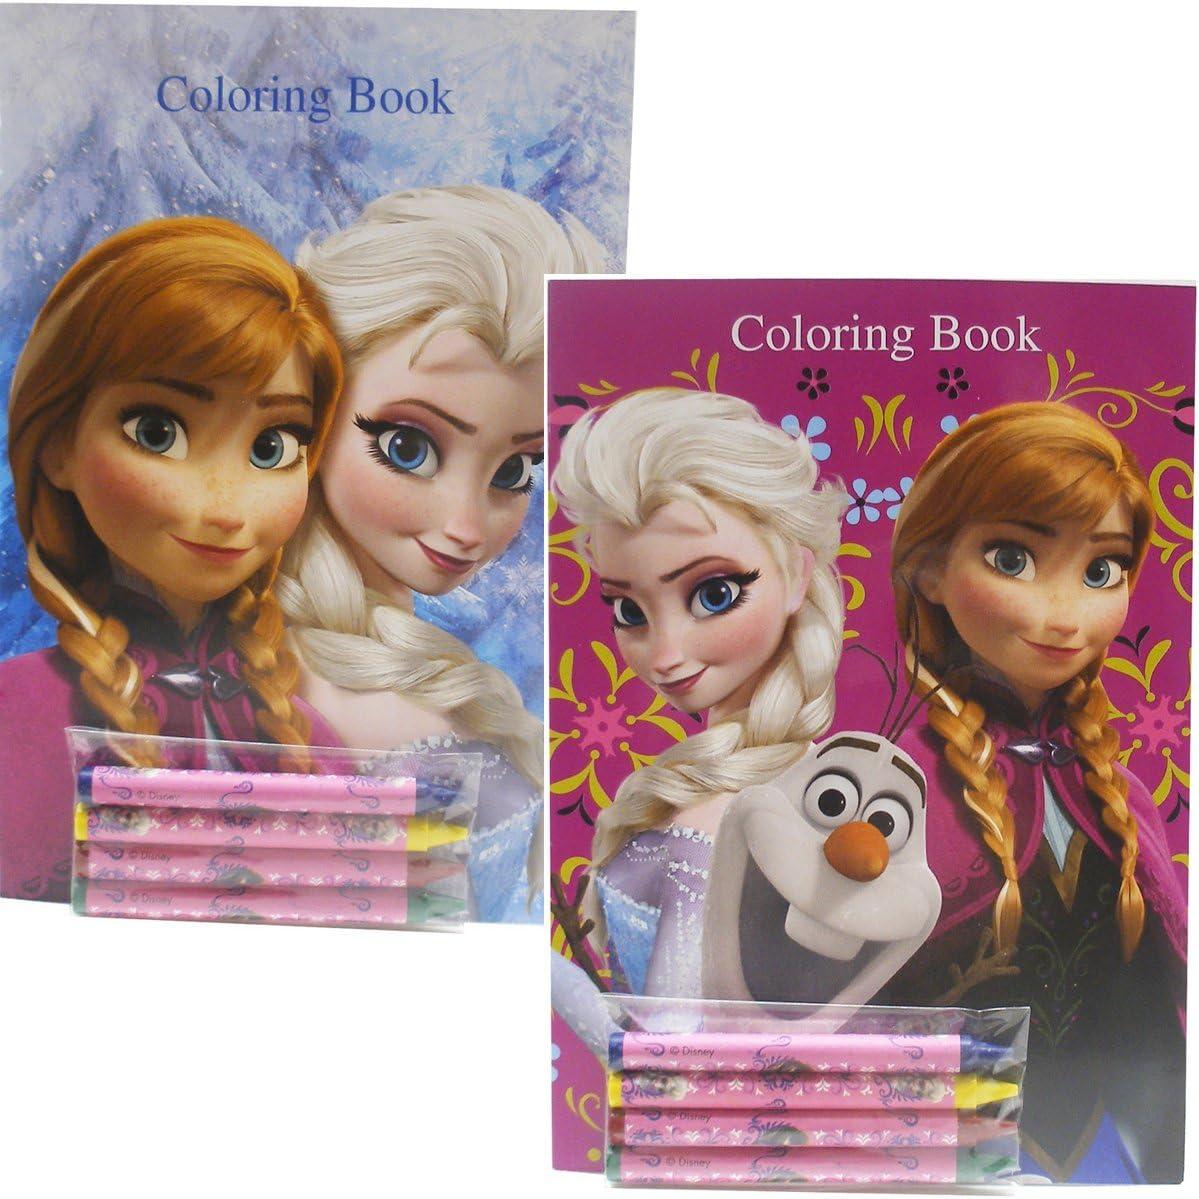 - Amazon.com: Disney Frozen Coloring Books Elsa Anna And Olaf (2